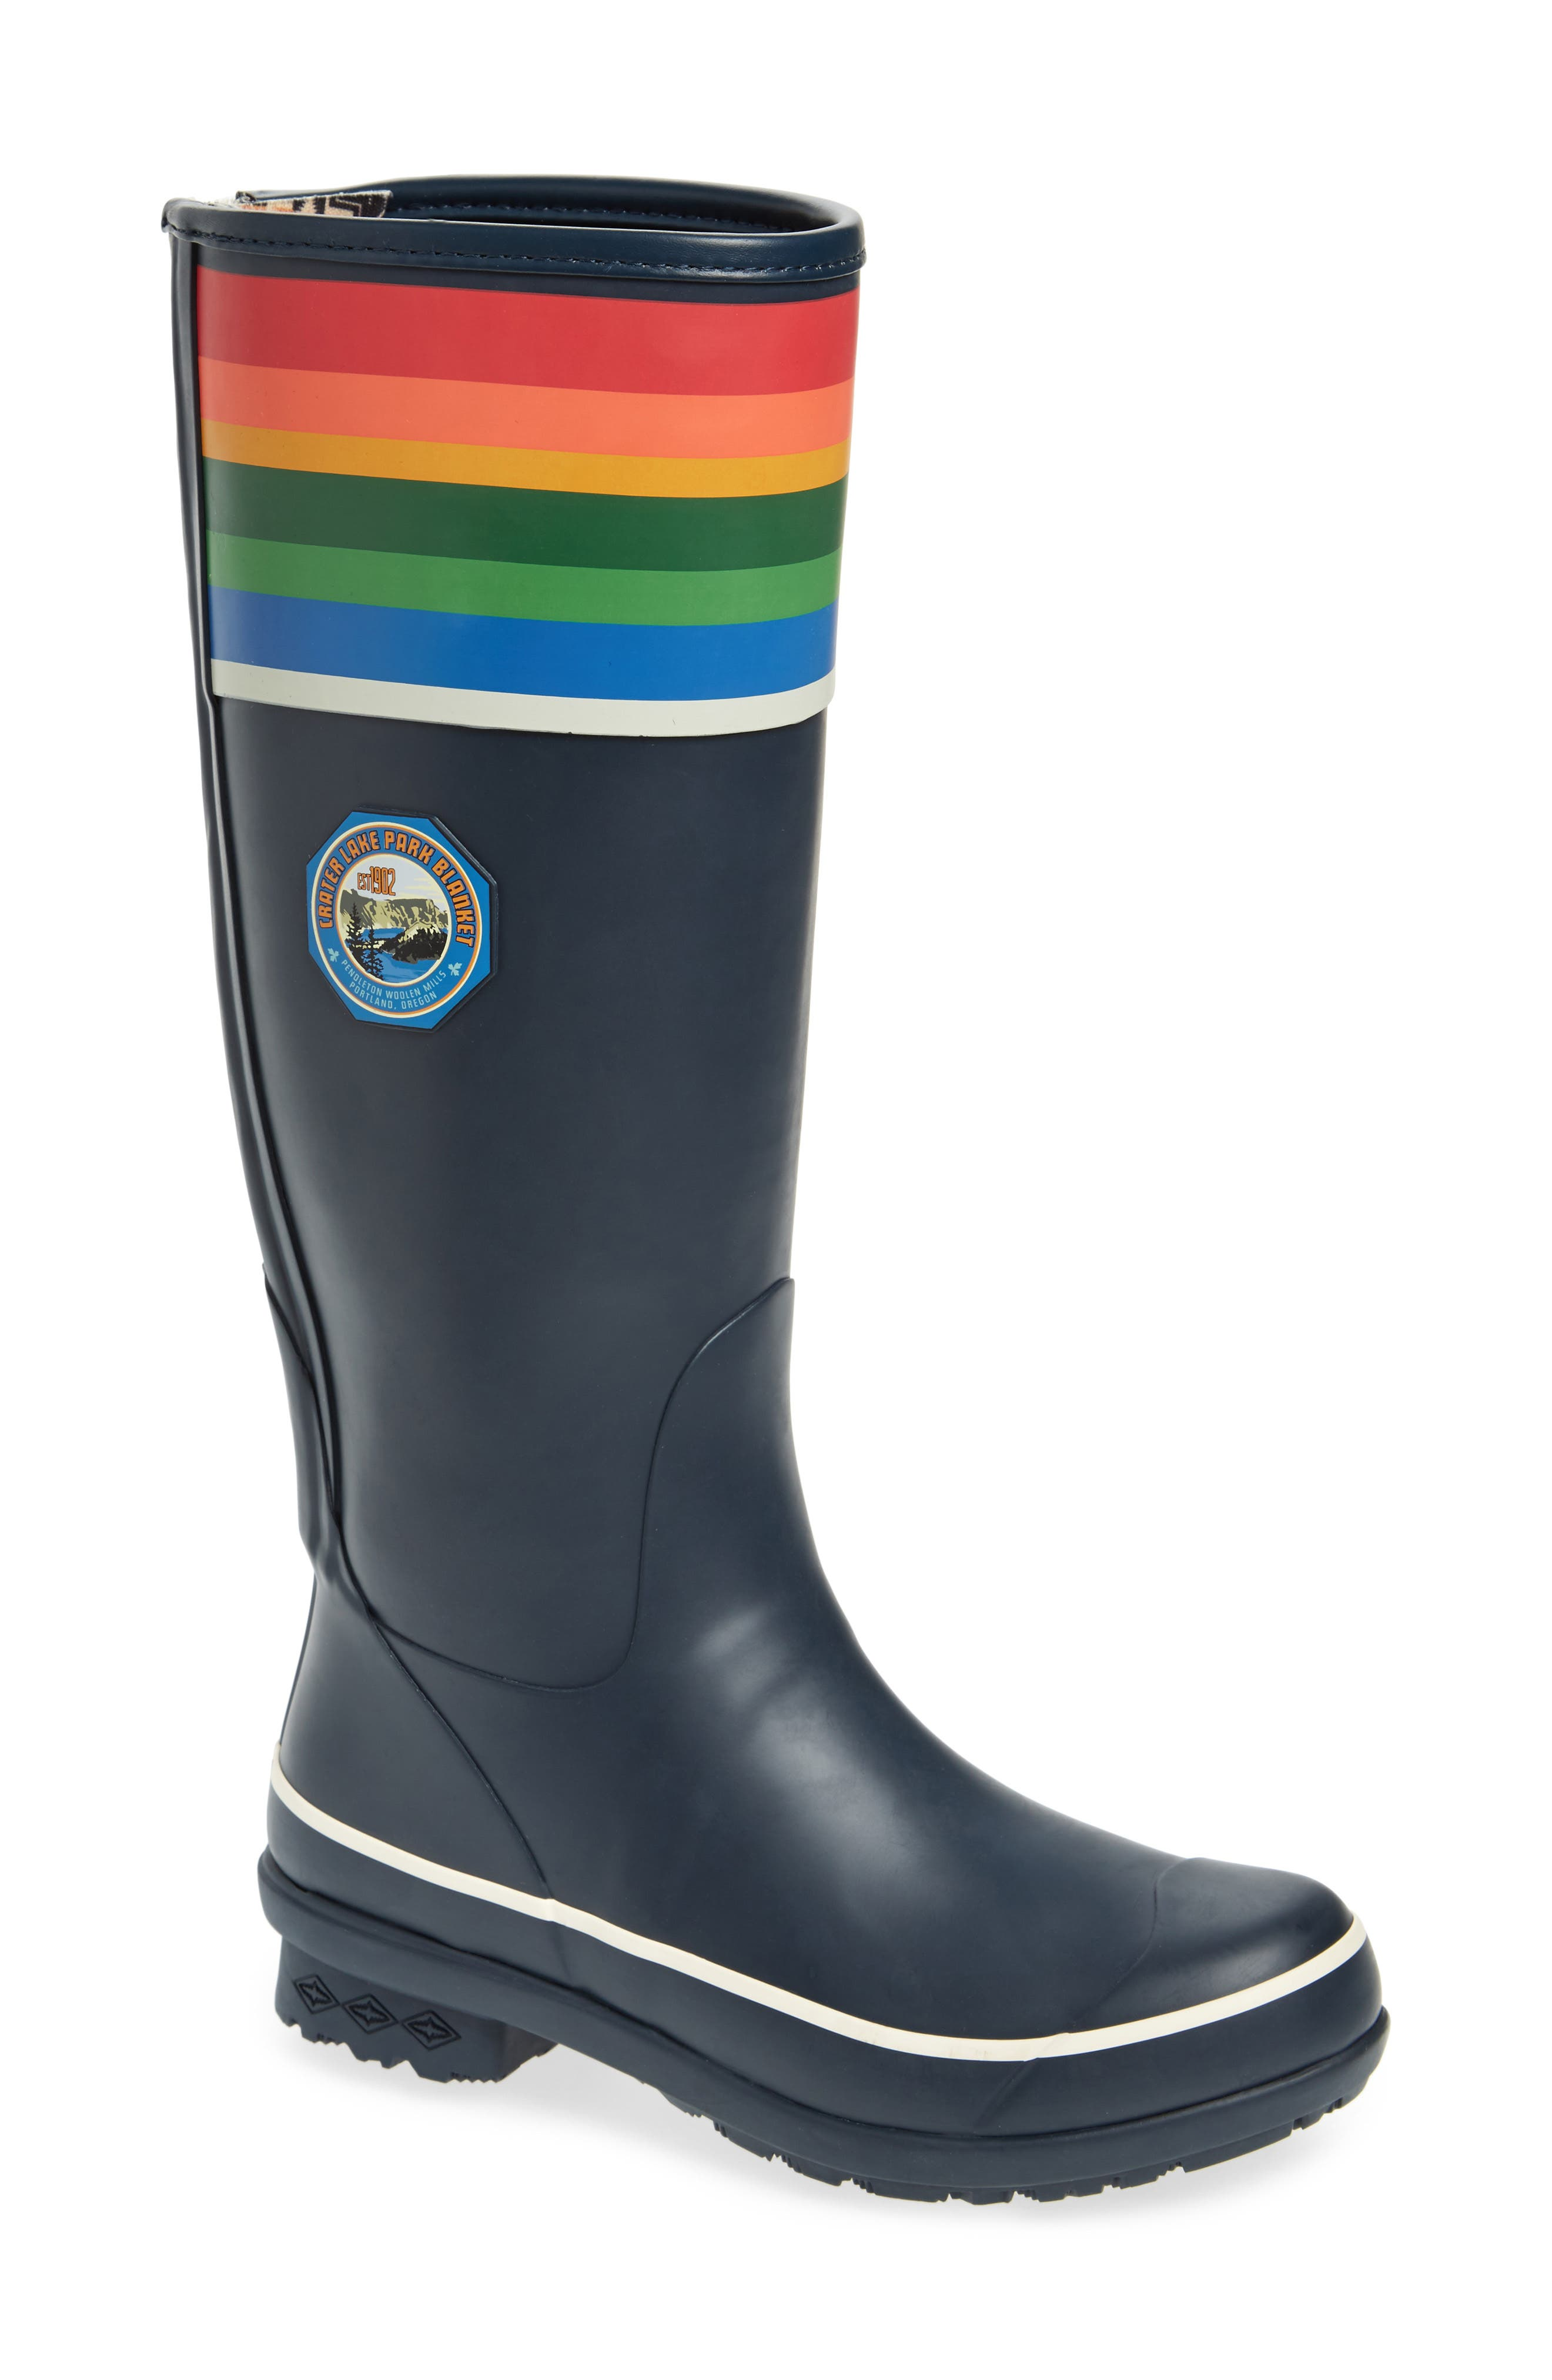 Alternate Image 1 Selected - Pendleton Crater Lake National Park Tall Rain Boot (Women)